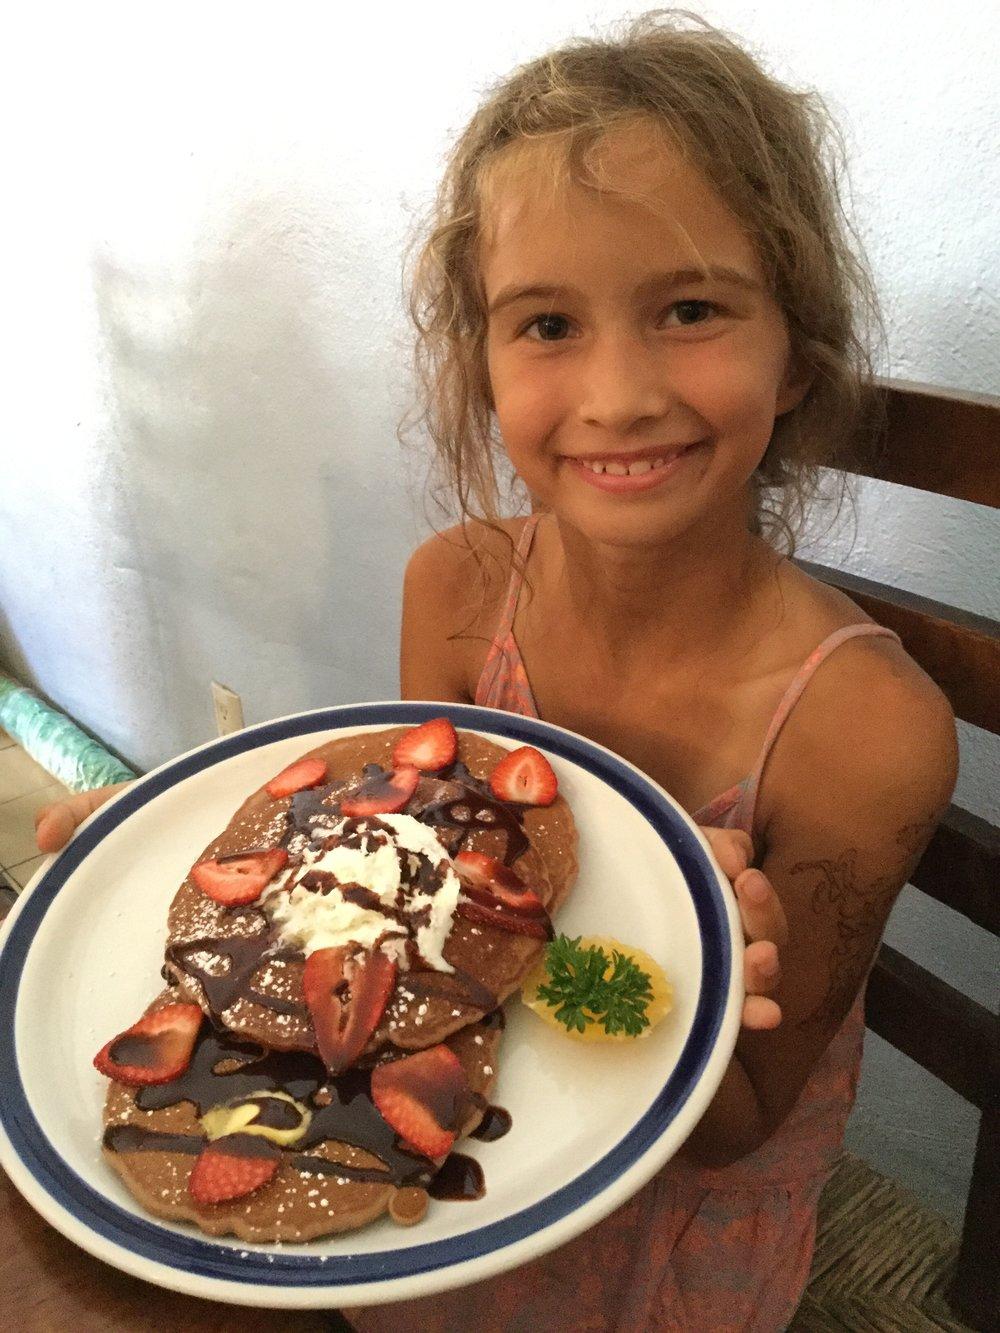 Oh yeah. Chocolate strawberry pancakes.